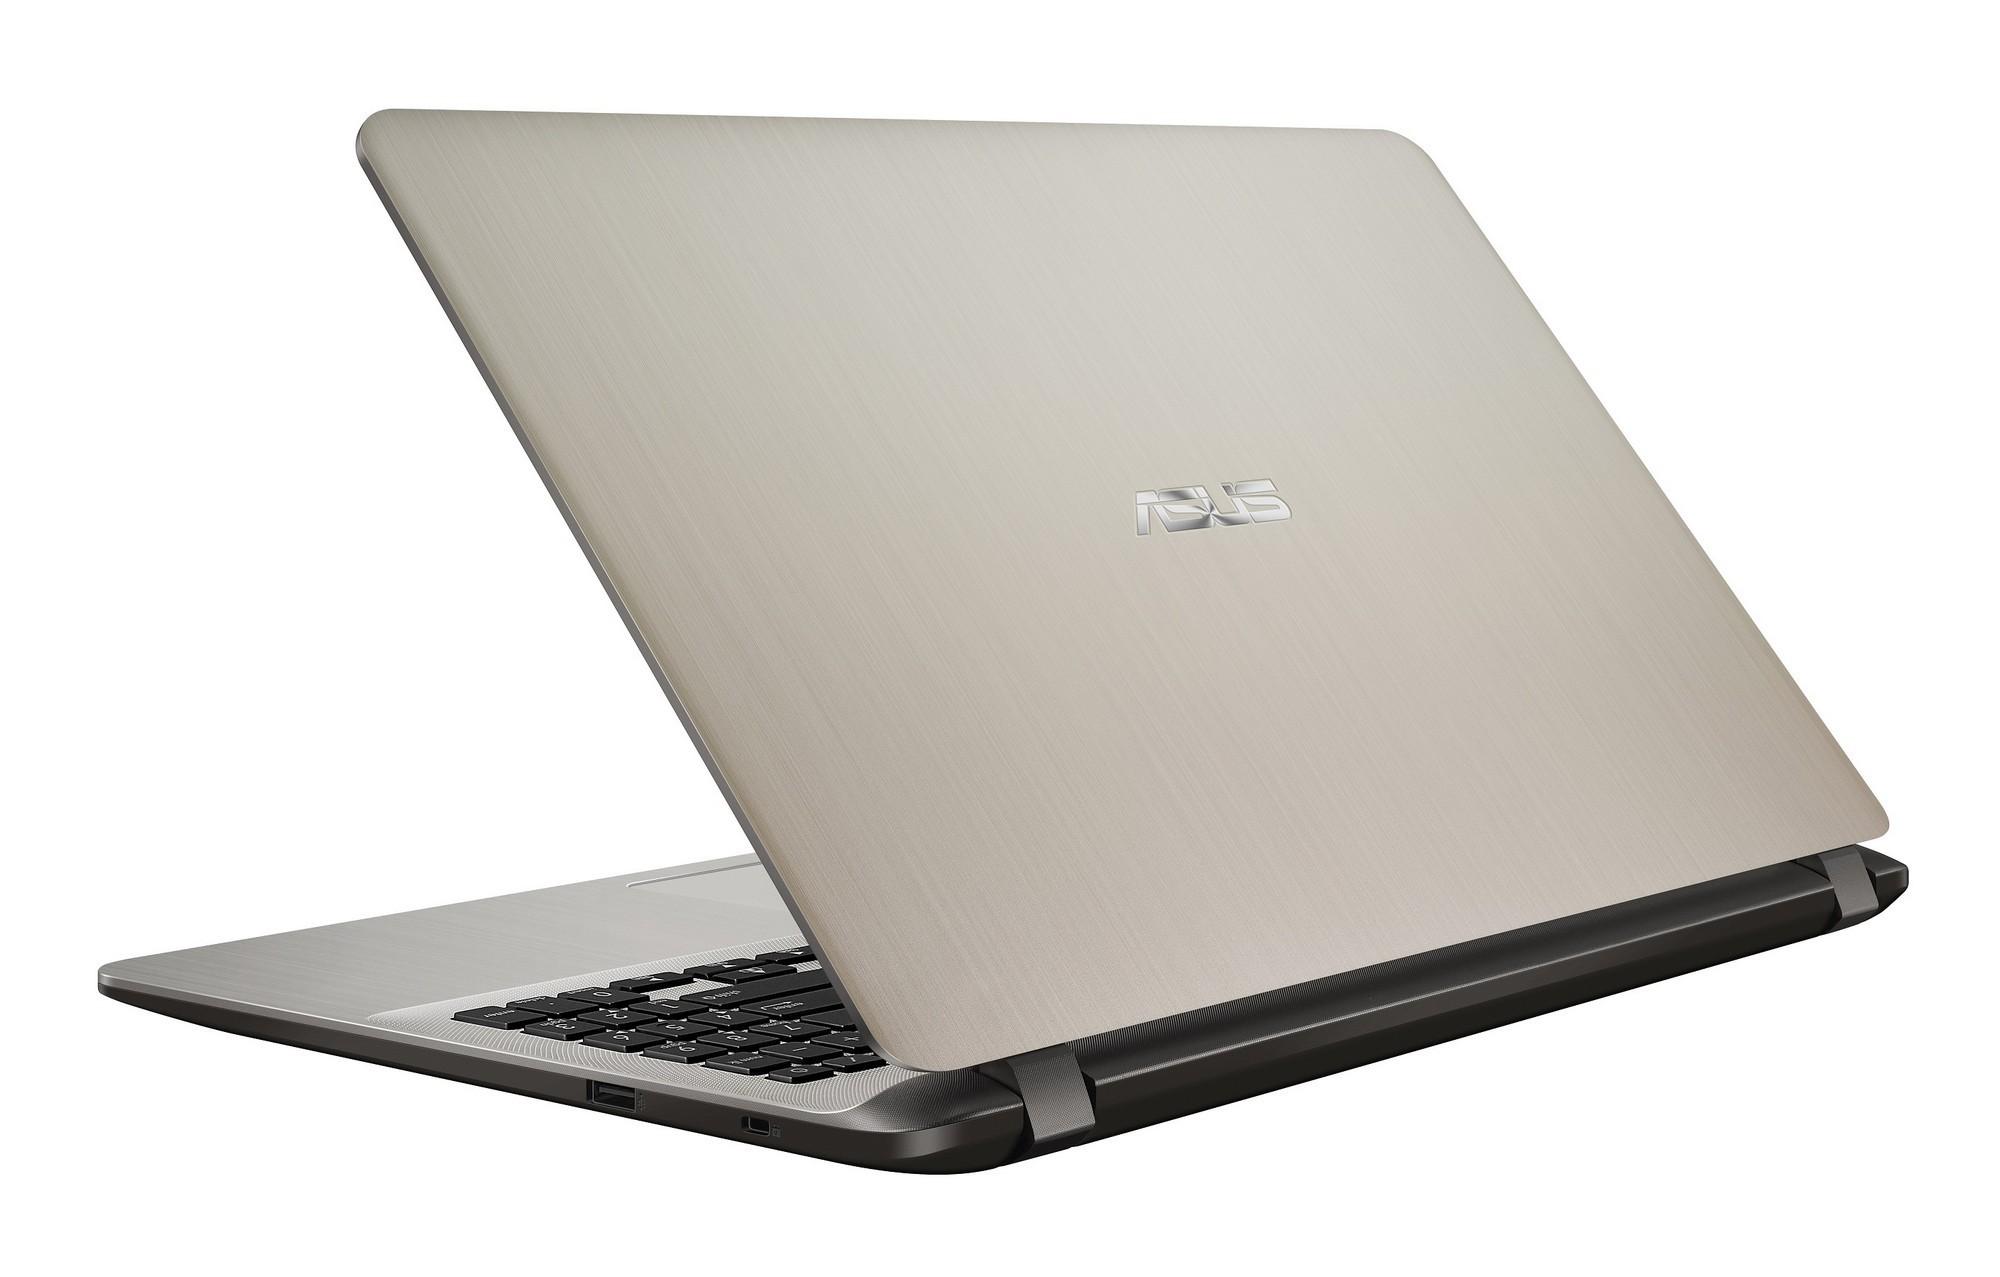 computer portatile offerta asus 15  Asus X507, notebook da 15 pollici a 379 euro - Tom's Hardware